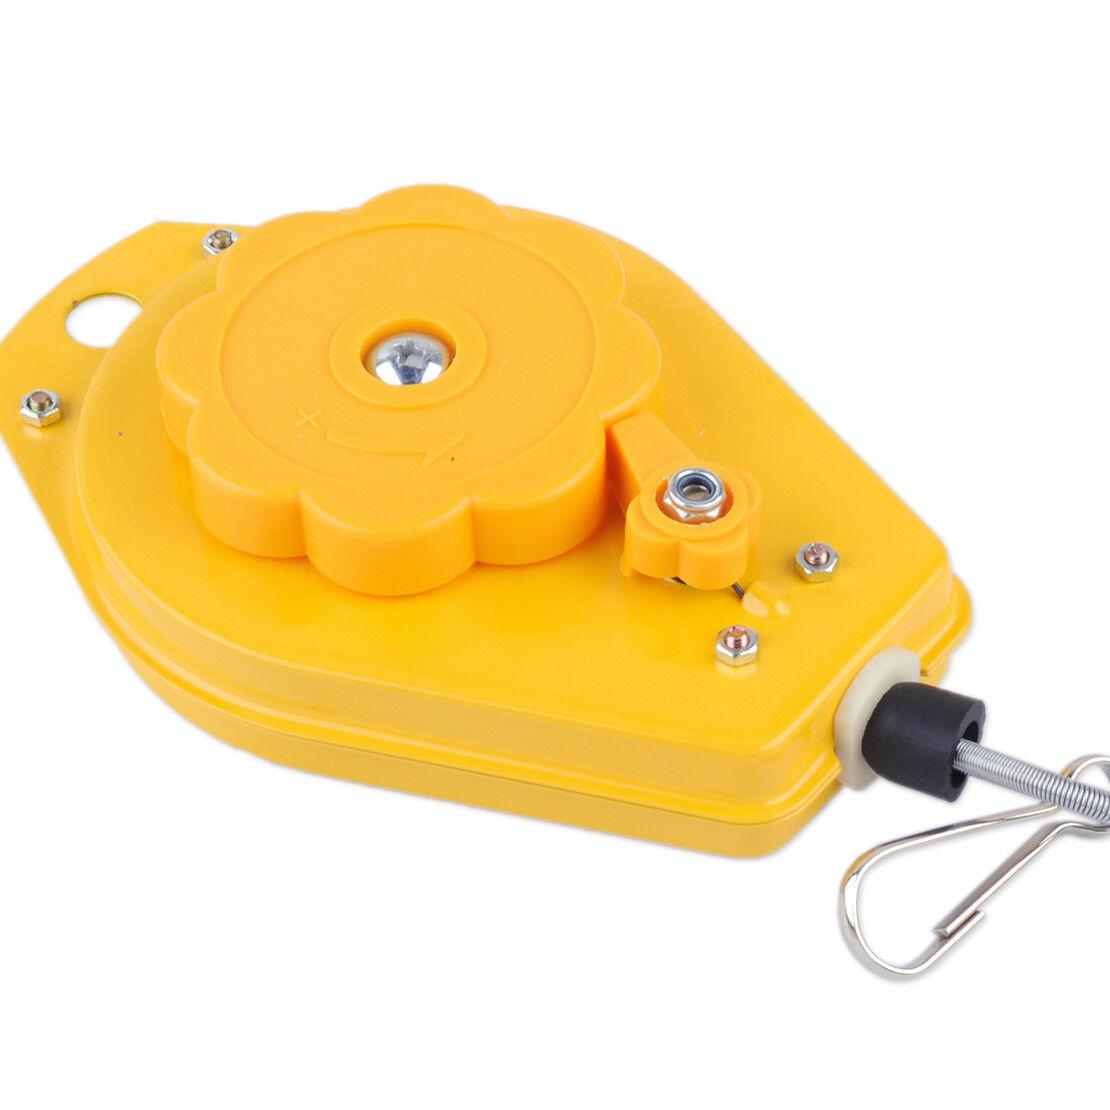 Einziehbar Federzug Balancer 3 Drahtseil Spring Balancer Fließband Werkzeug